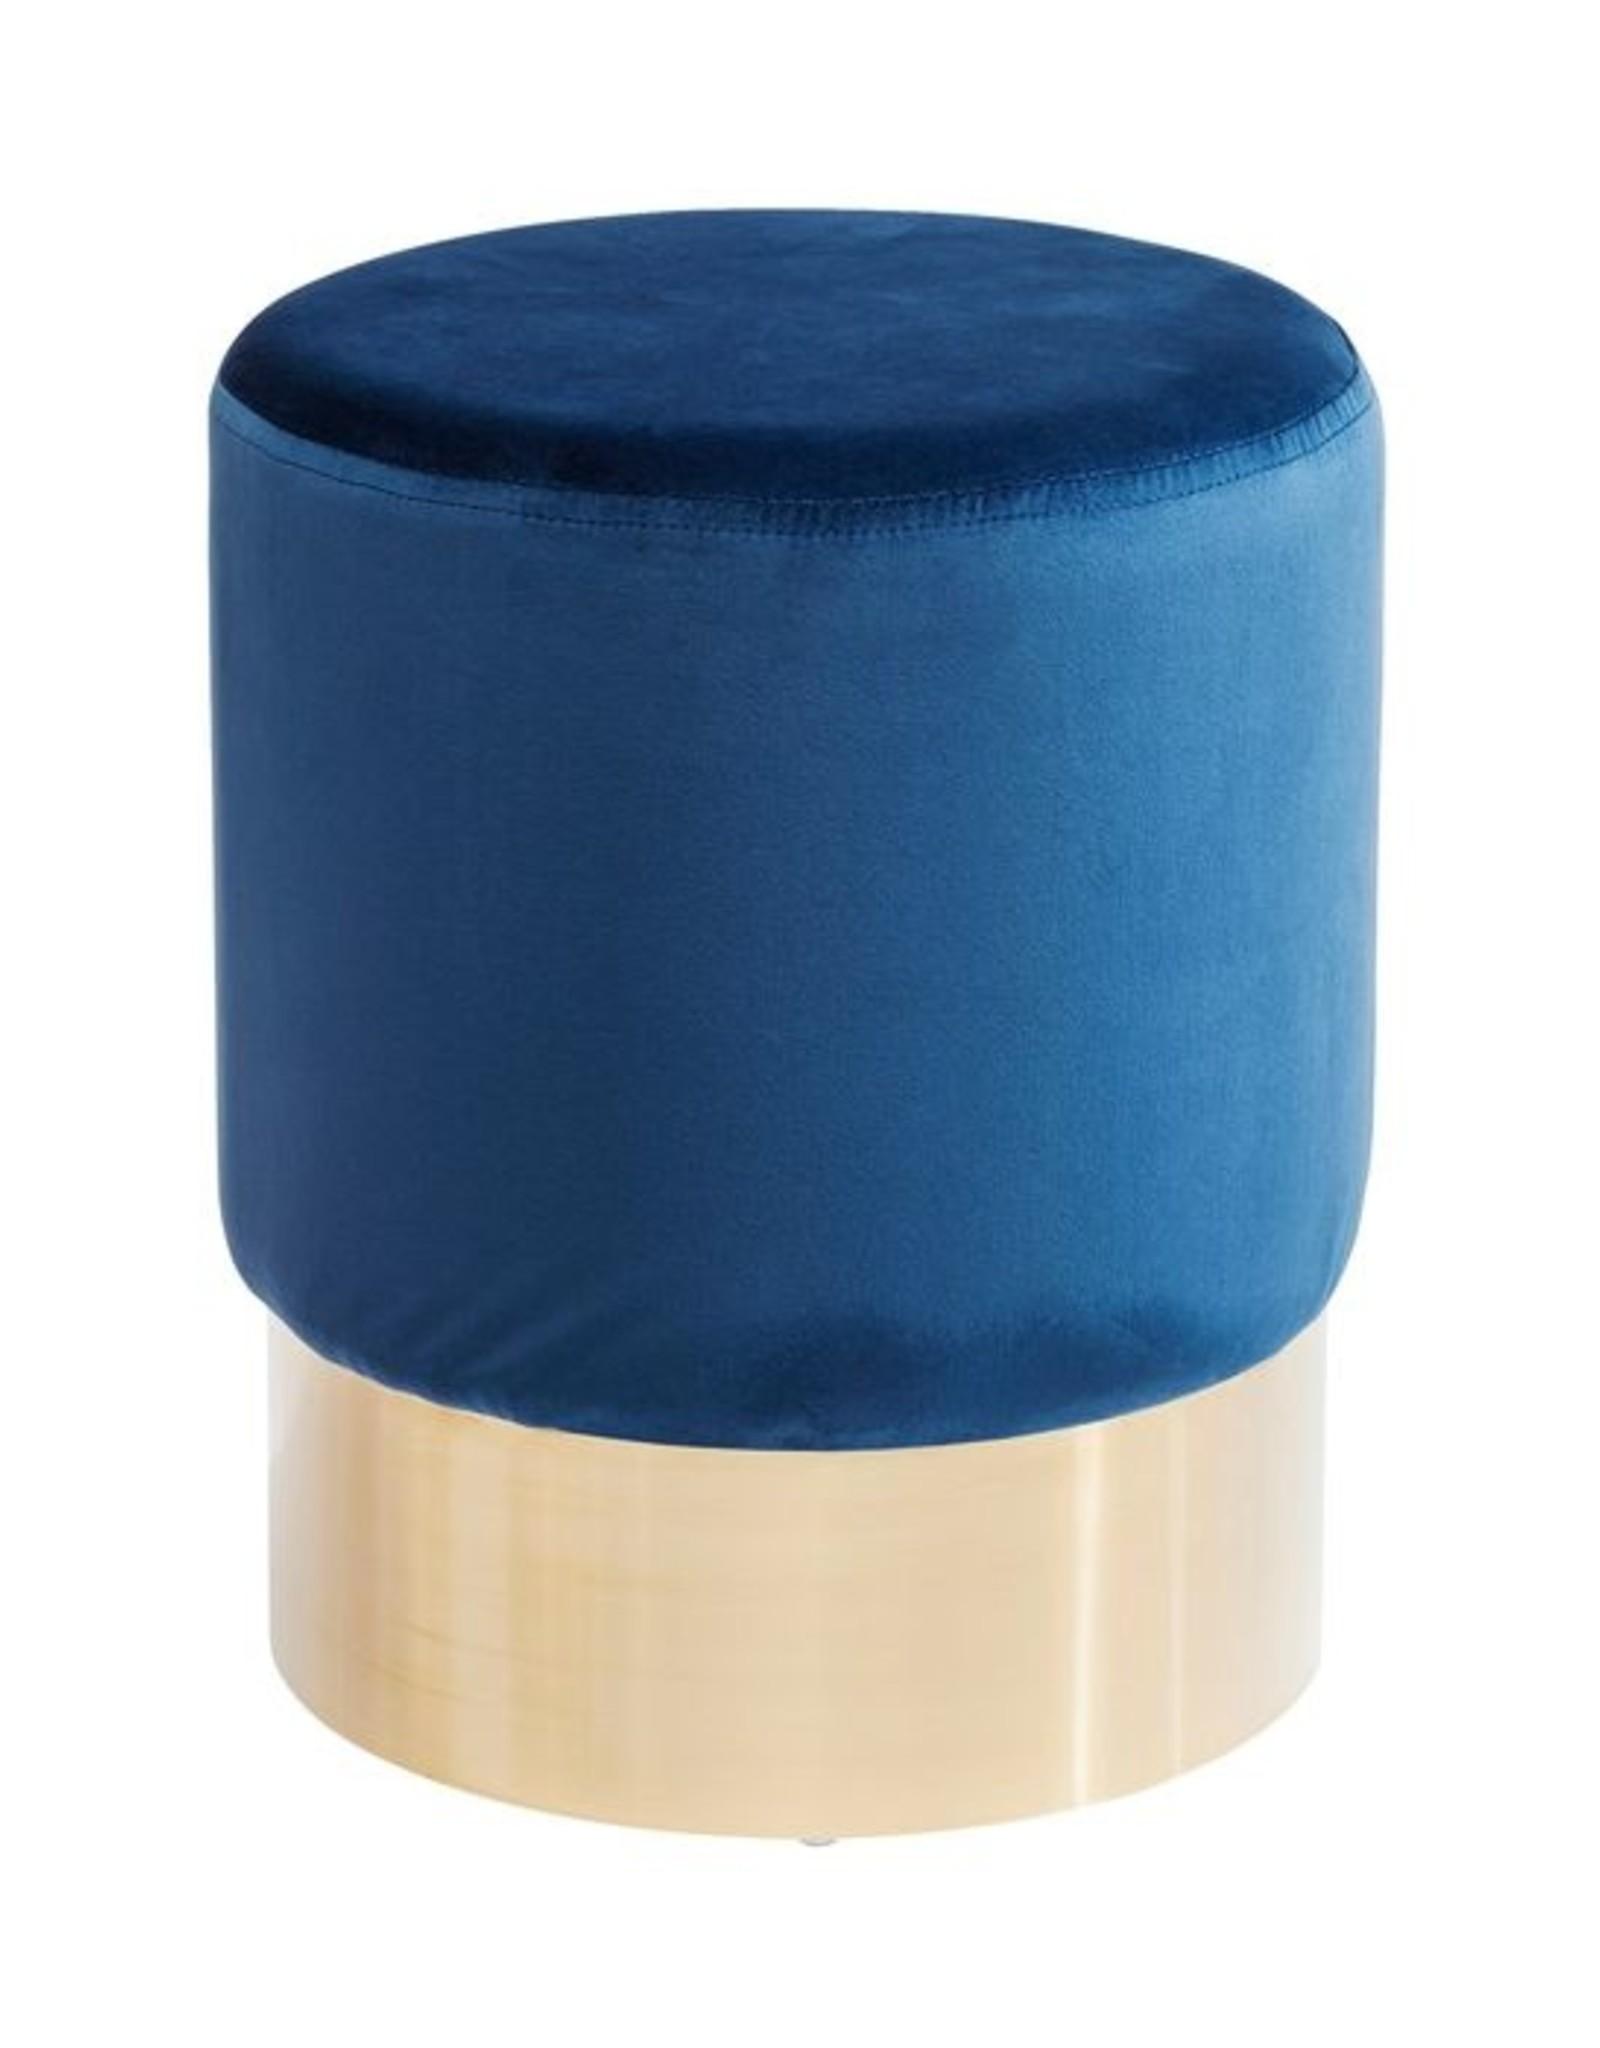 KARE DESIGN Stool Cherry Blue Brass Ø35cm